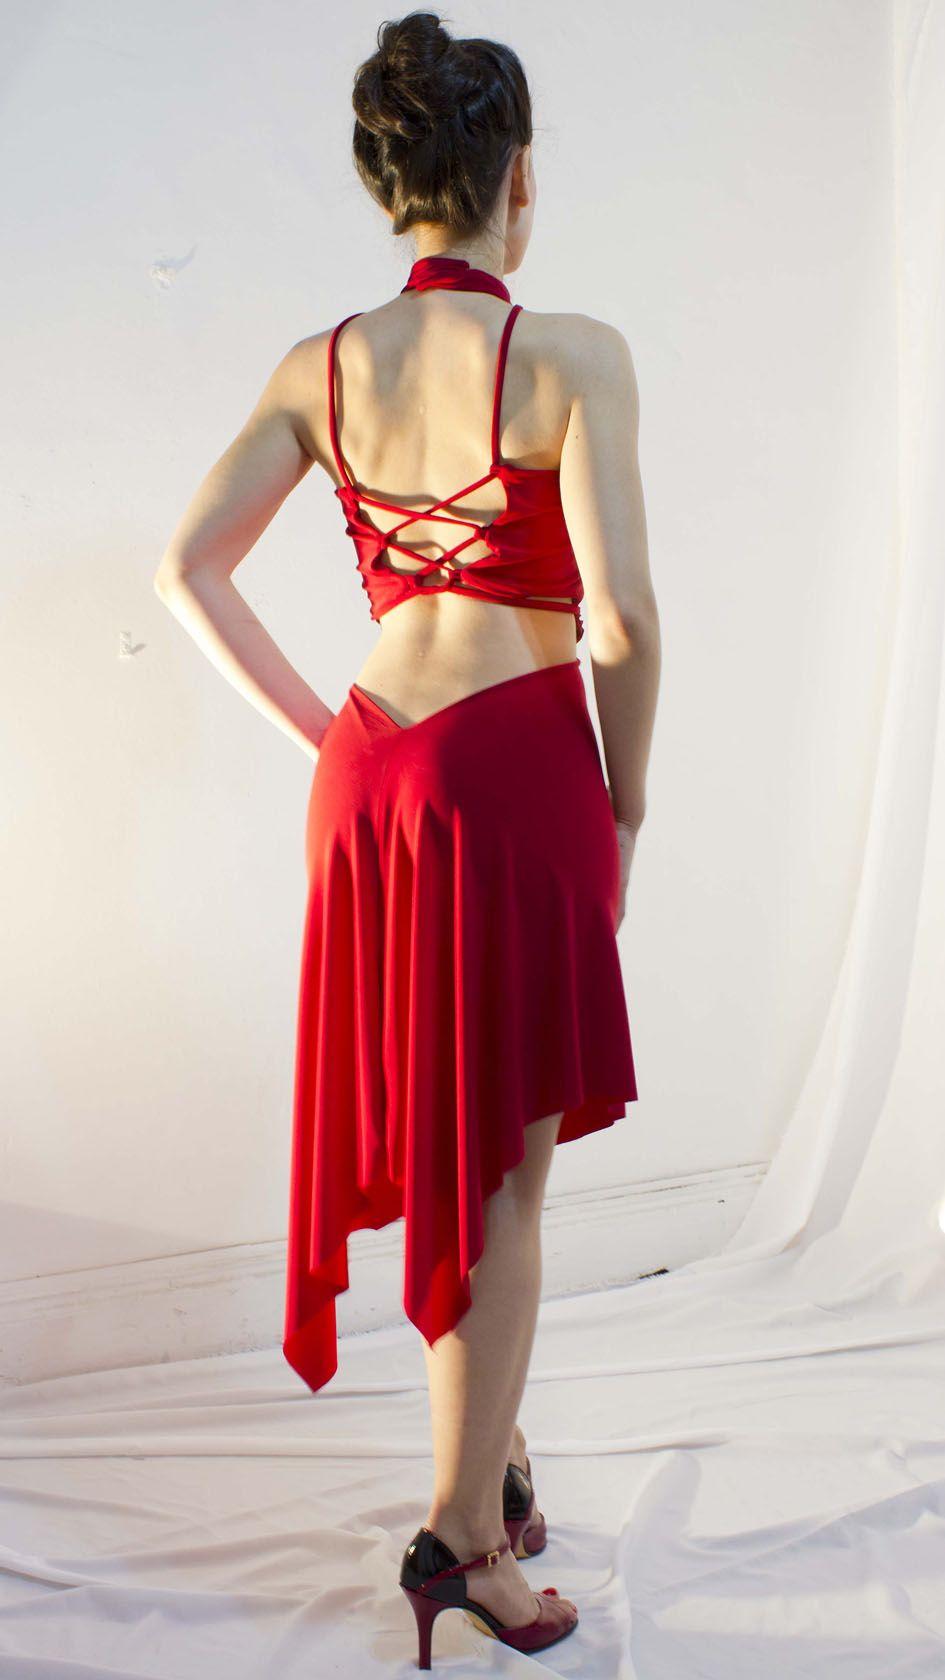 ea7575cd88 Shakira Dress - TANGO IMAGEN - MARIA JAZMIN - DRESSES